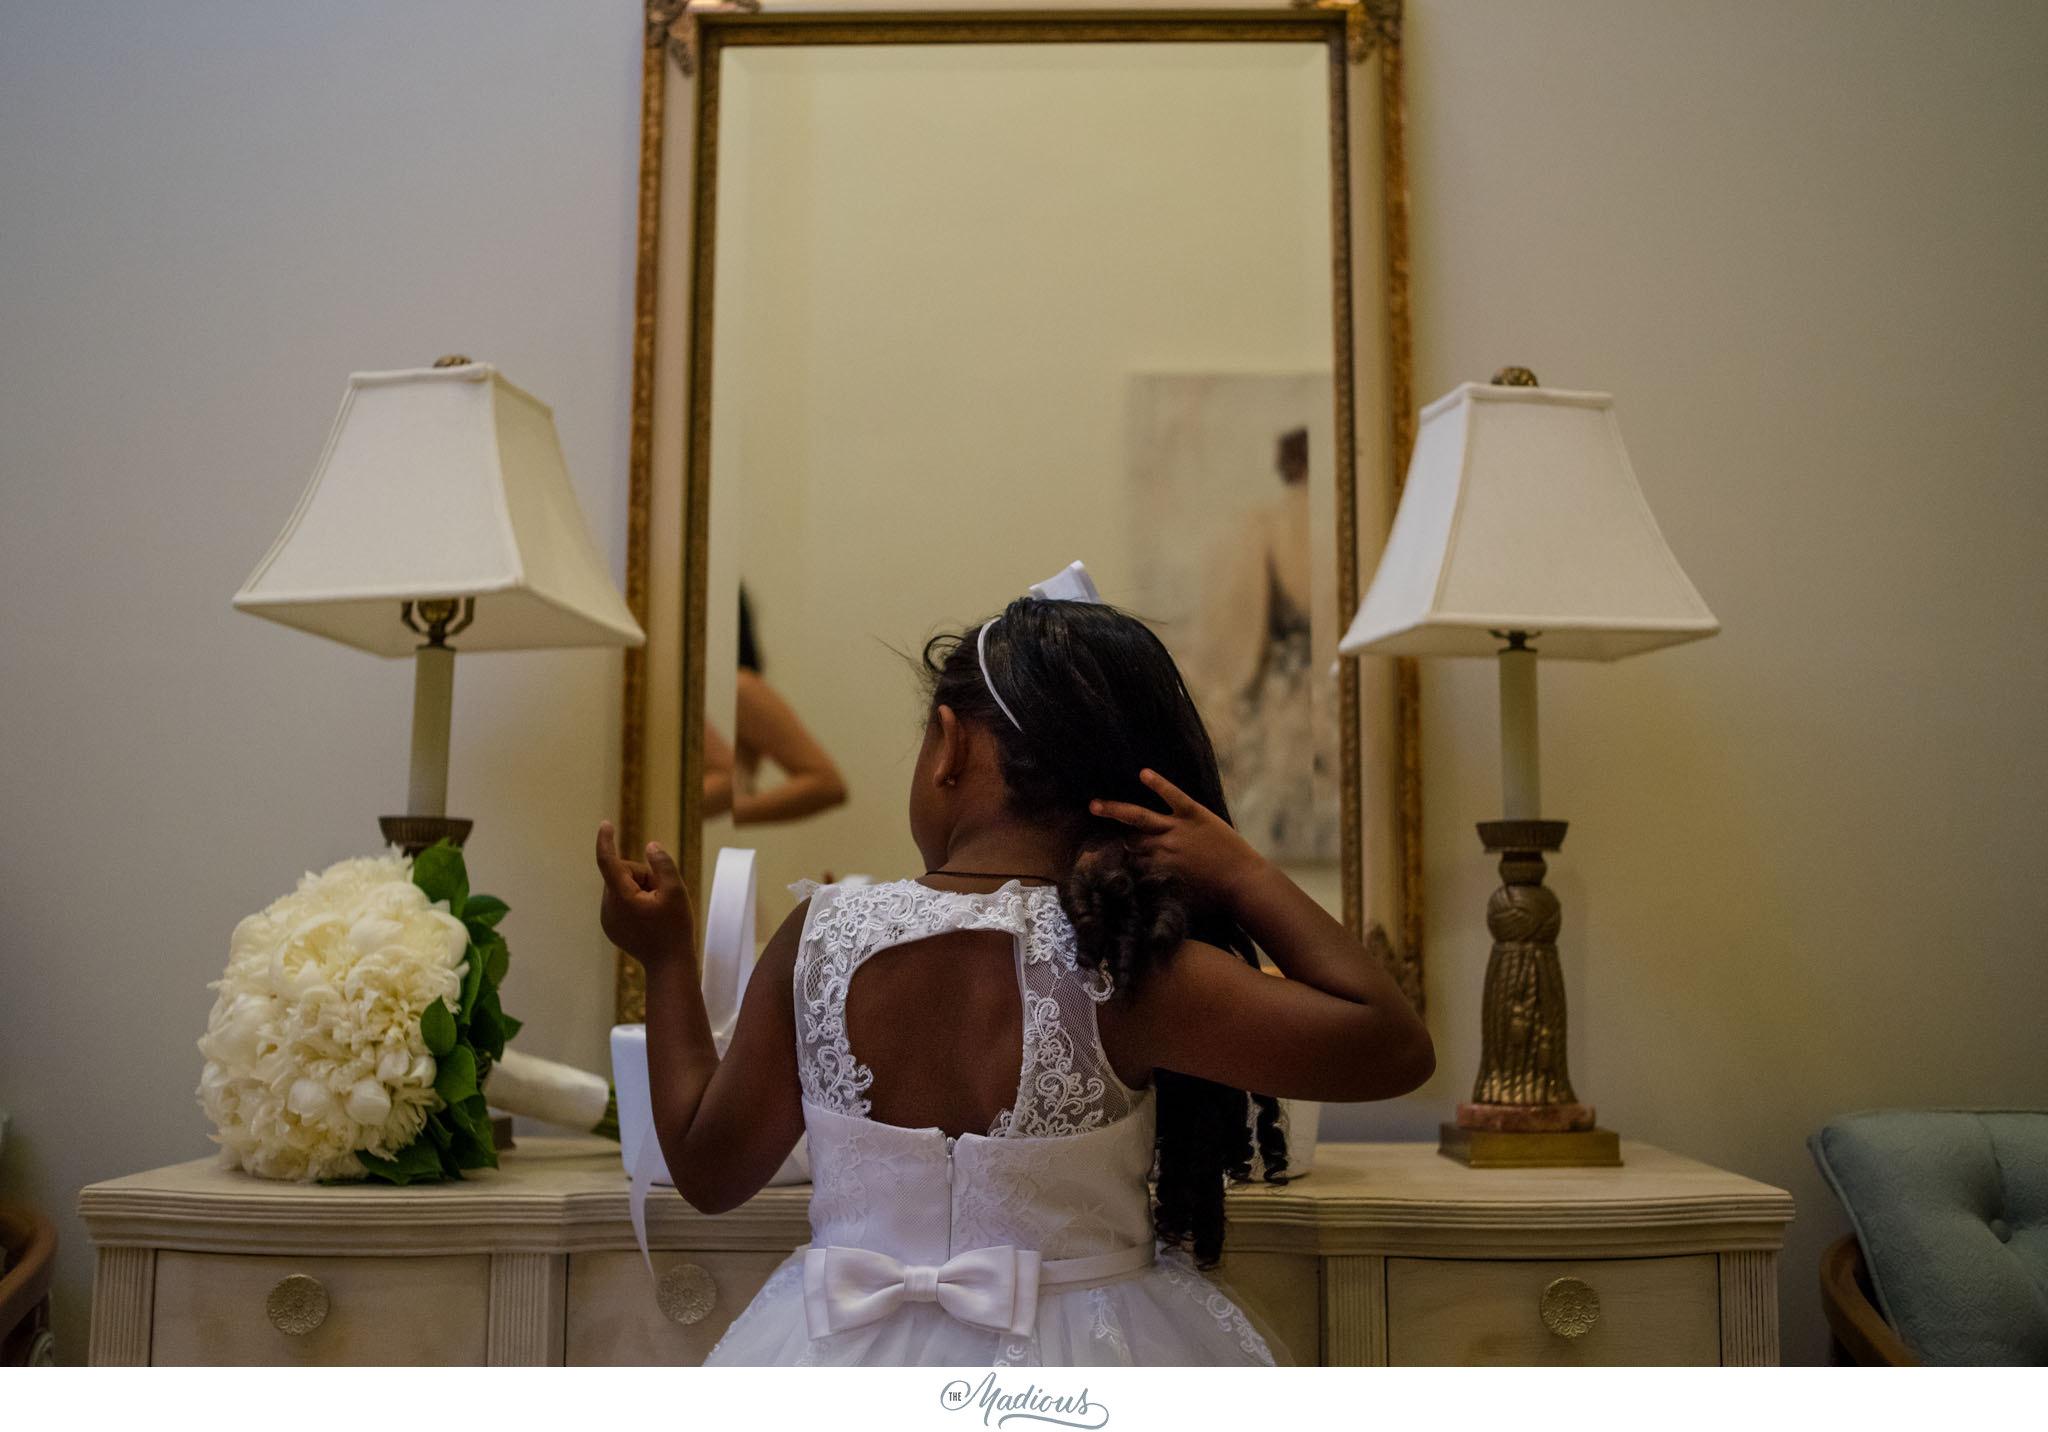 nmwa+wedding,+women+in+the+arts+wedding,+ethiopian+wedding,+dc+wedding+0061.jpg